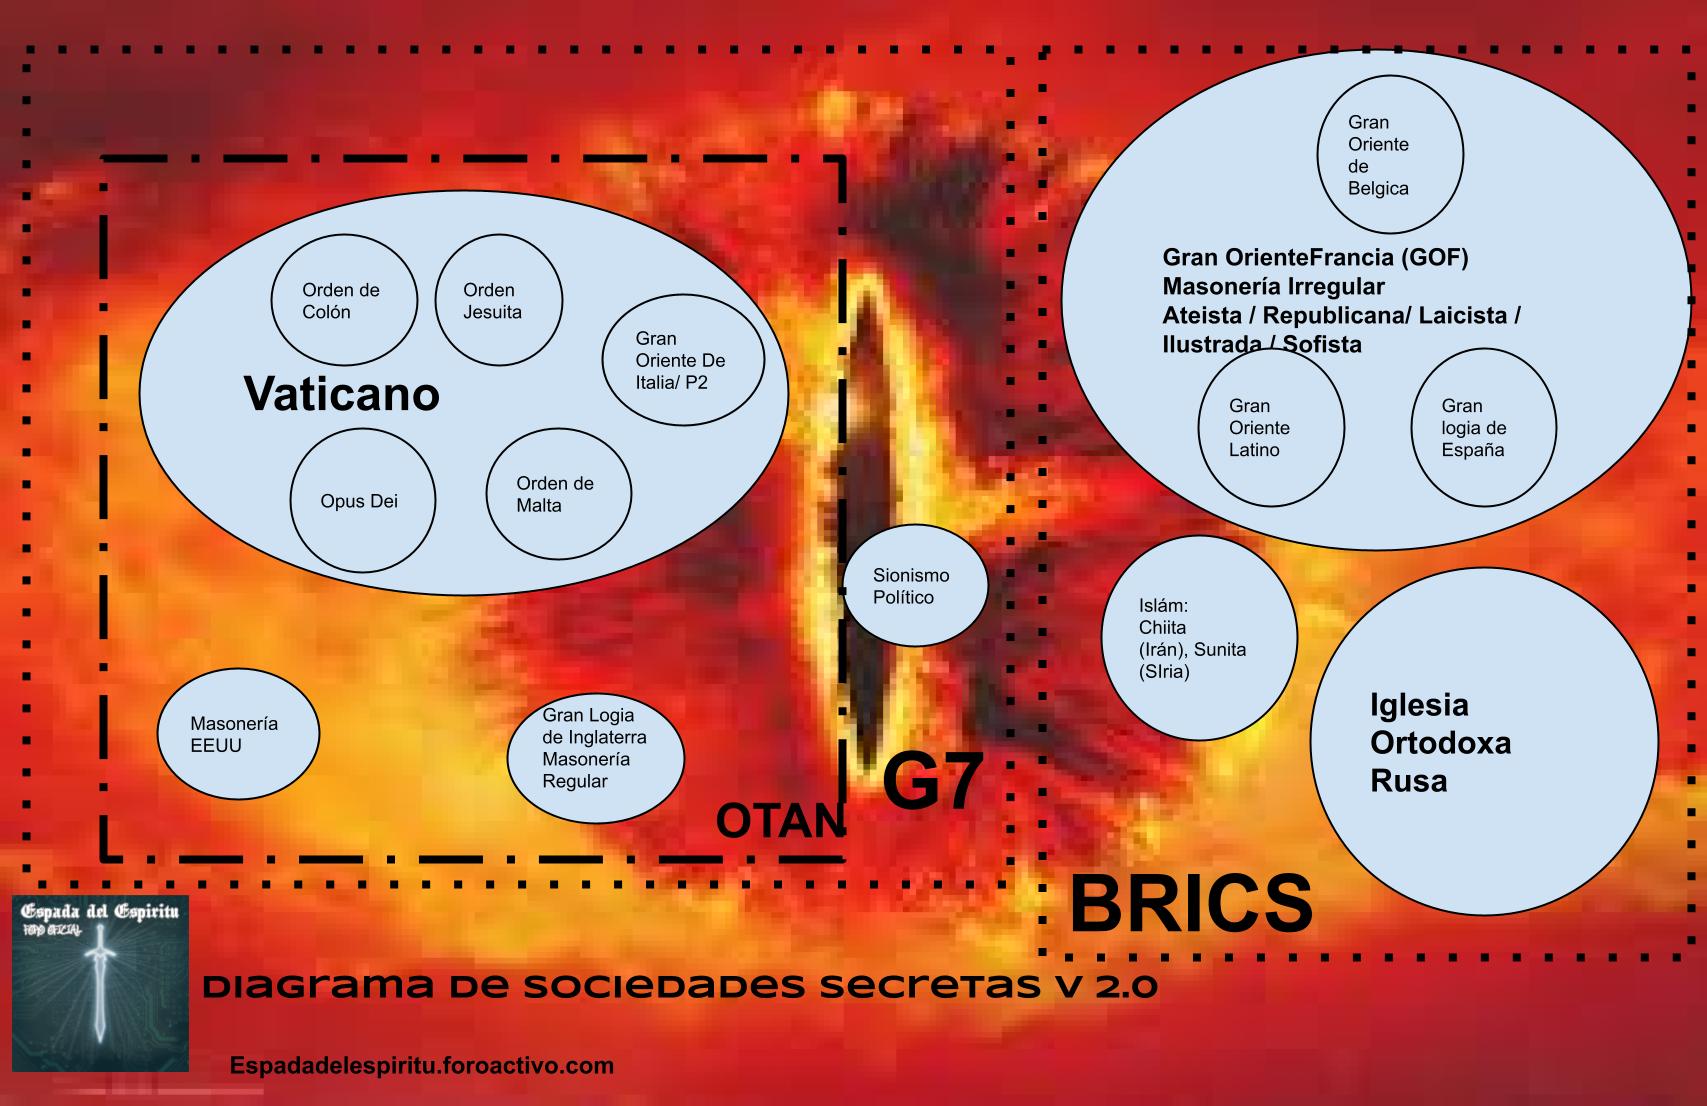 Gran Oriente de Italia: La orden masónica del Vaticano Pub?w=1708&h=1106